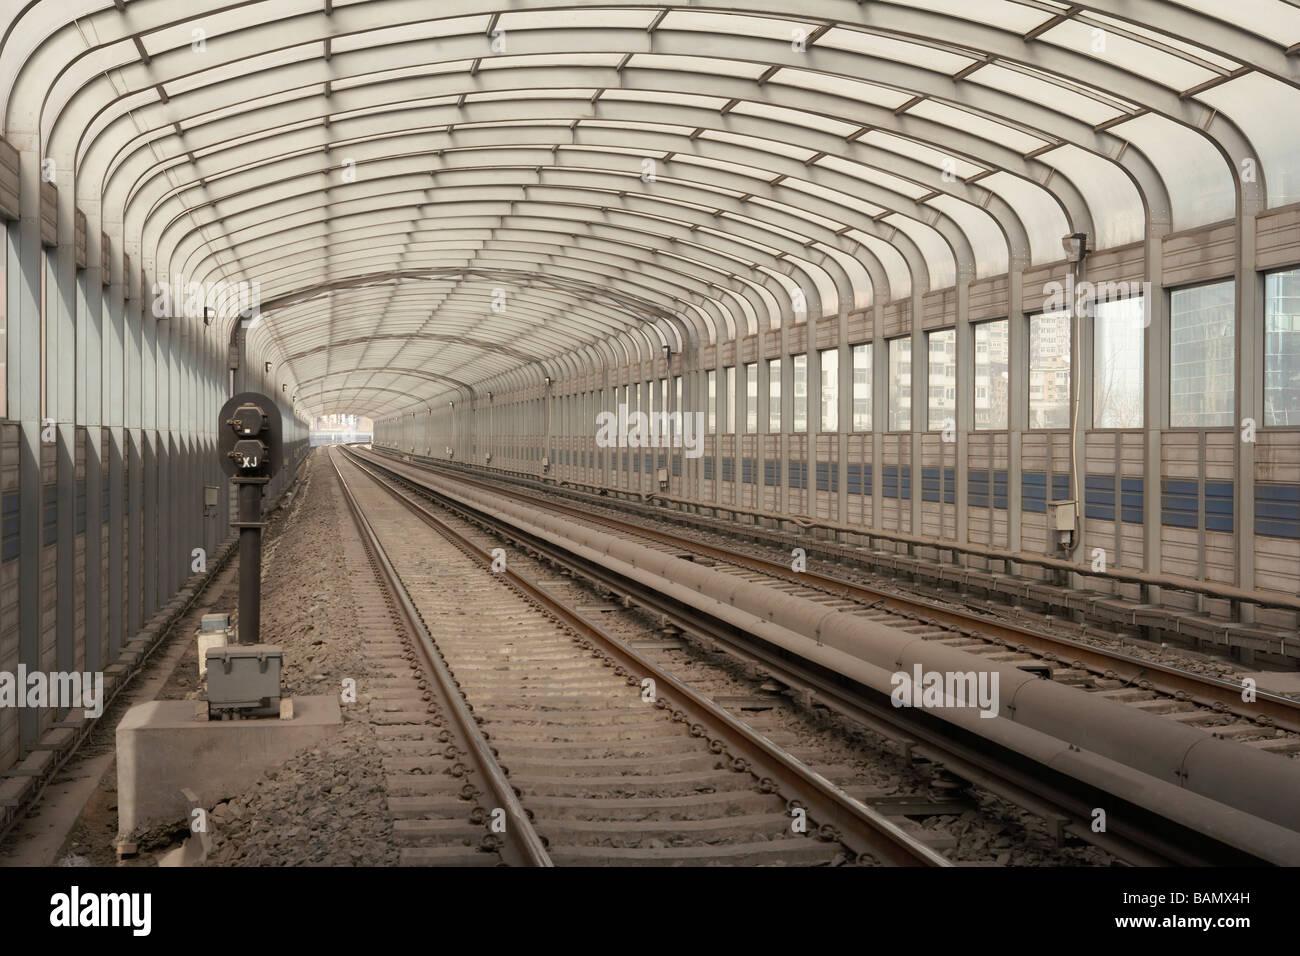 Glass Railway Station - Stock Image